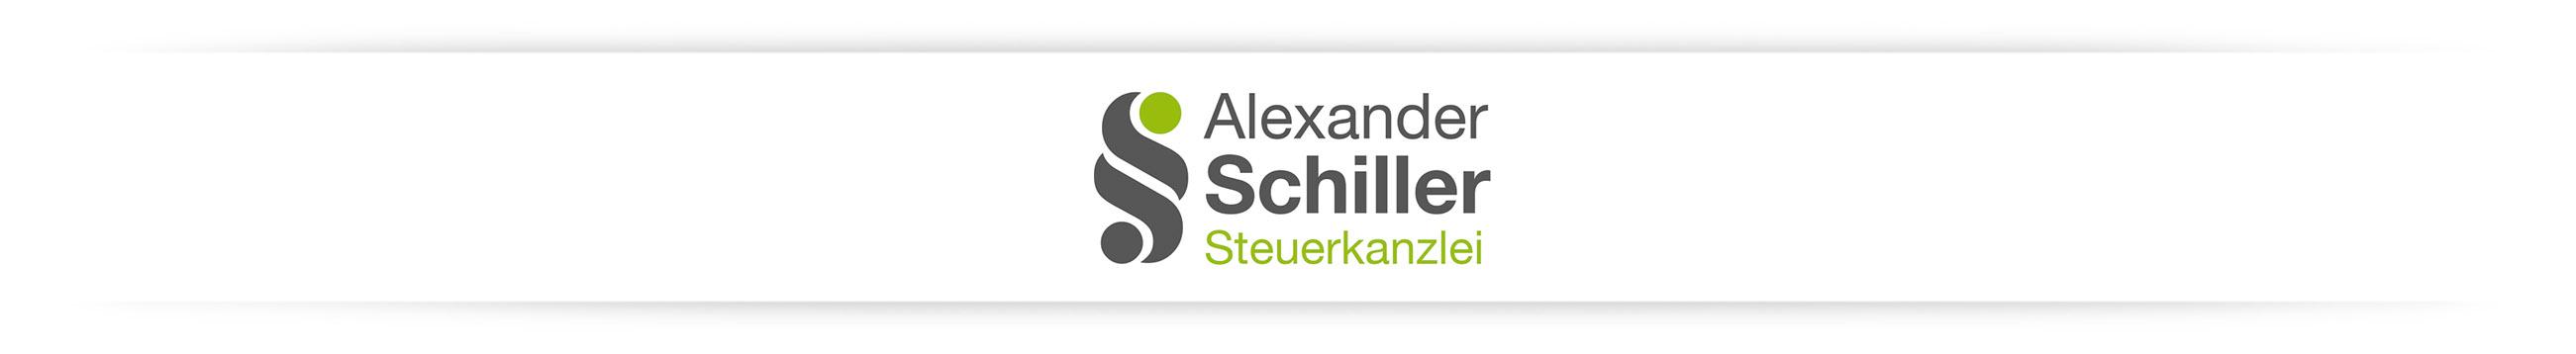 Schiller Steuerkanzlei